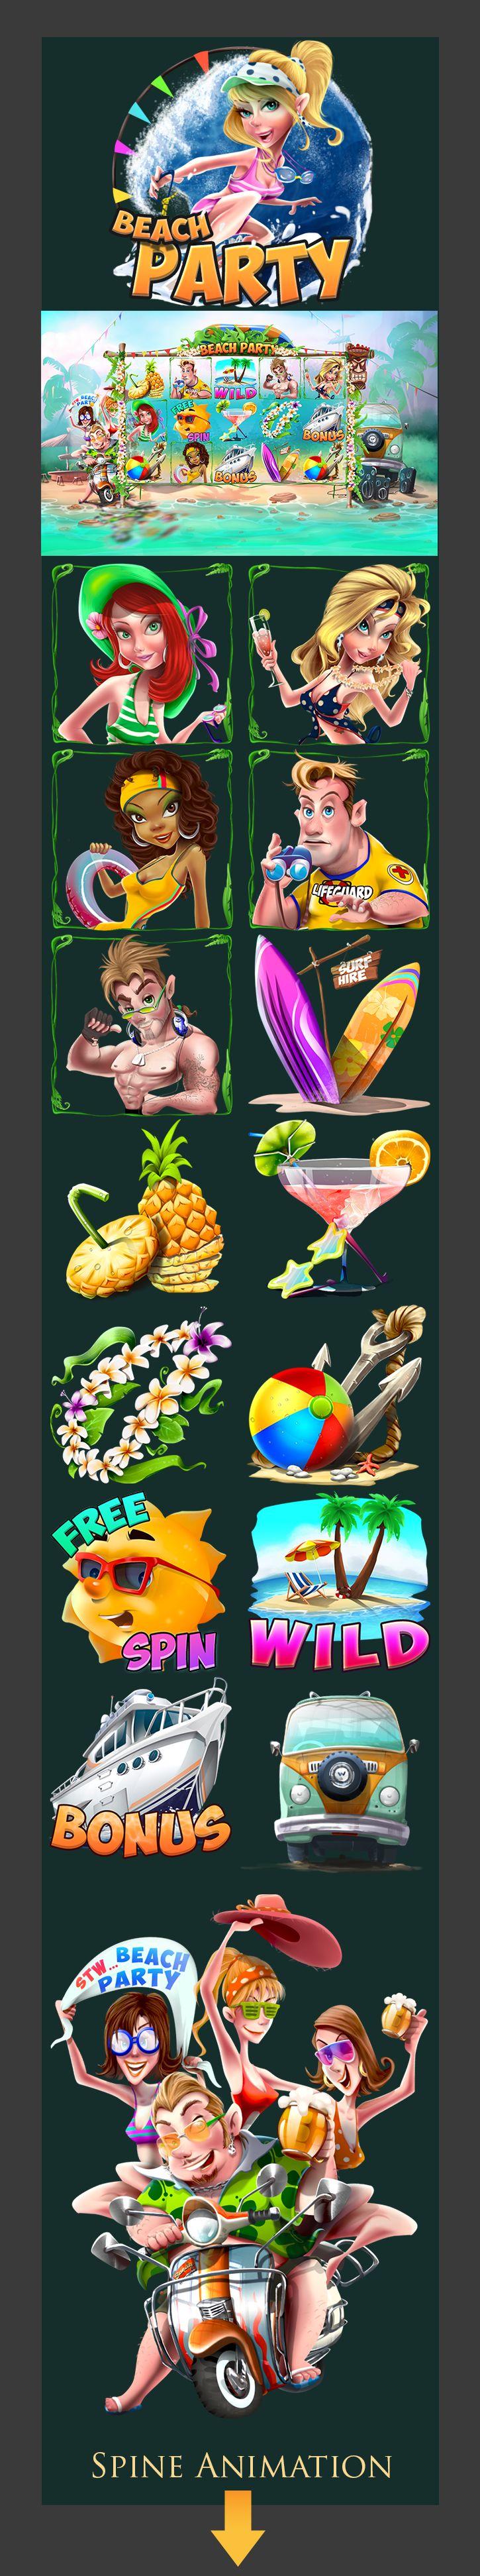 Slot machine_Casino _Beach-Party on Behance